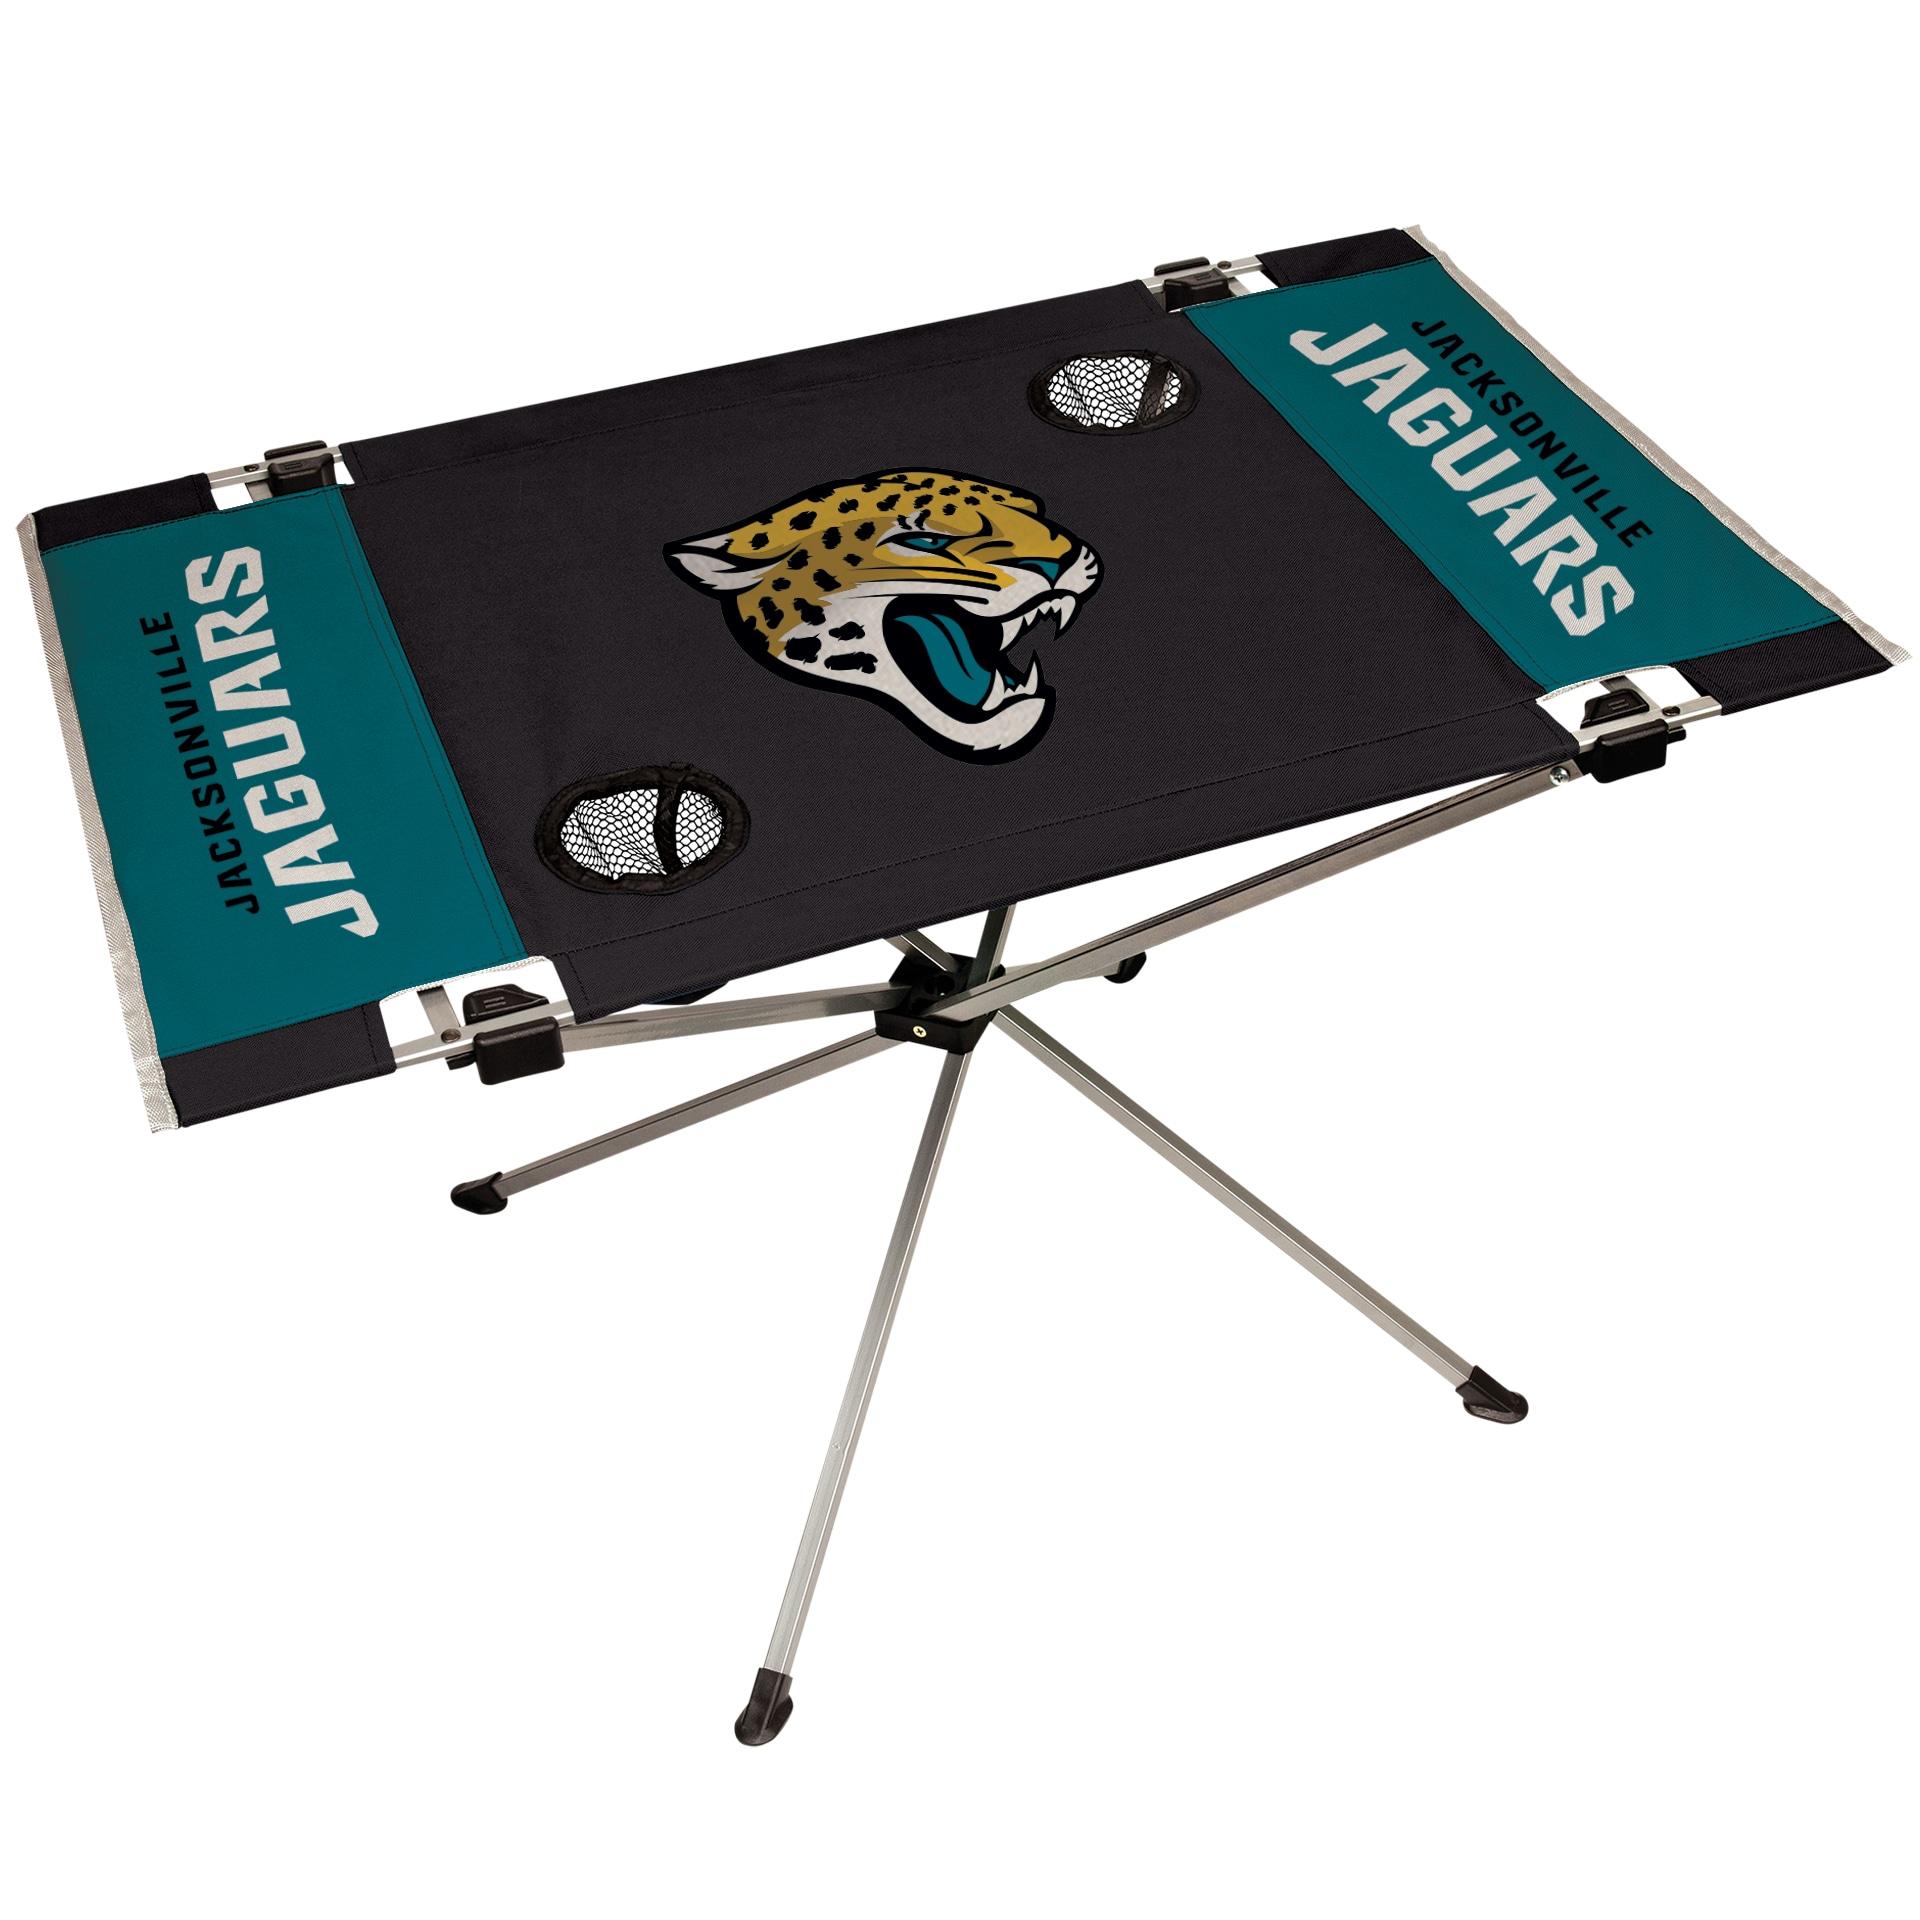 Jacksonville Jaguars End Zone Table